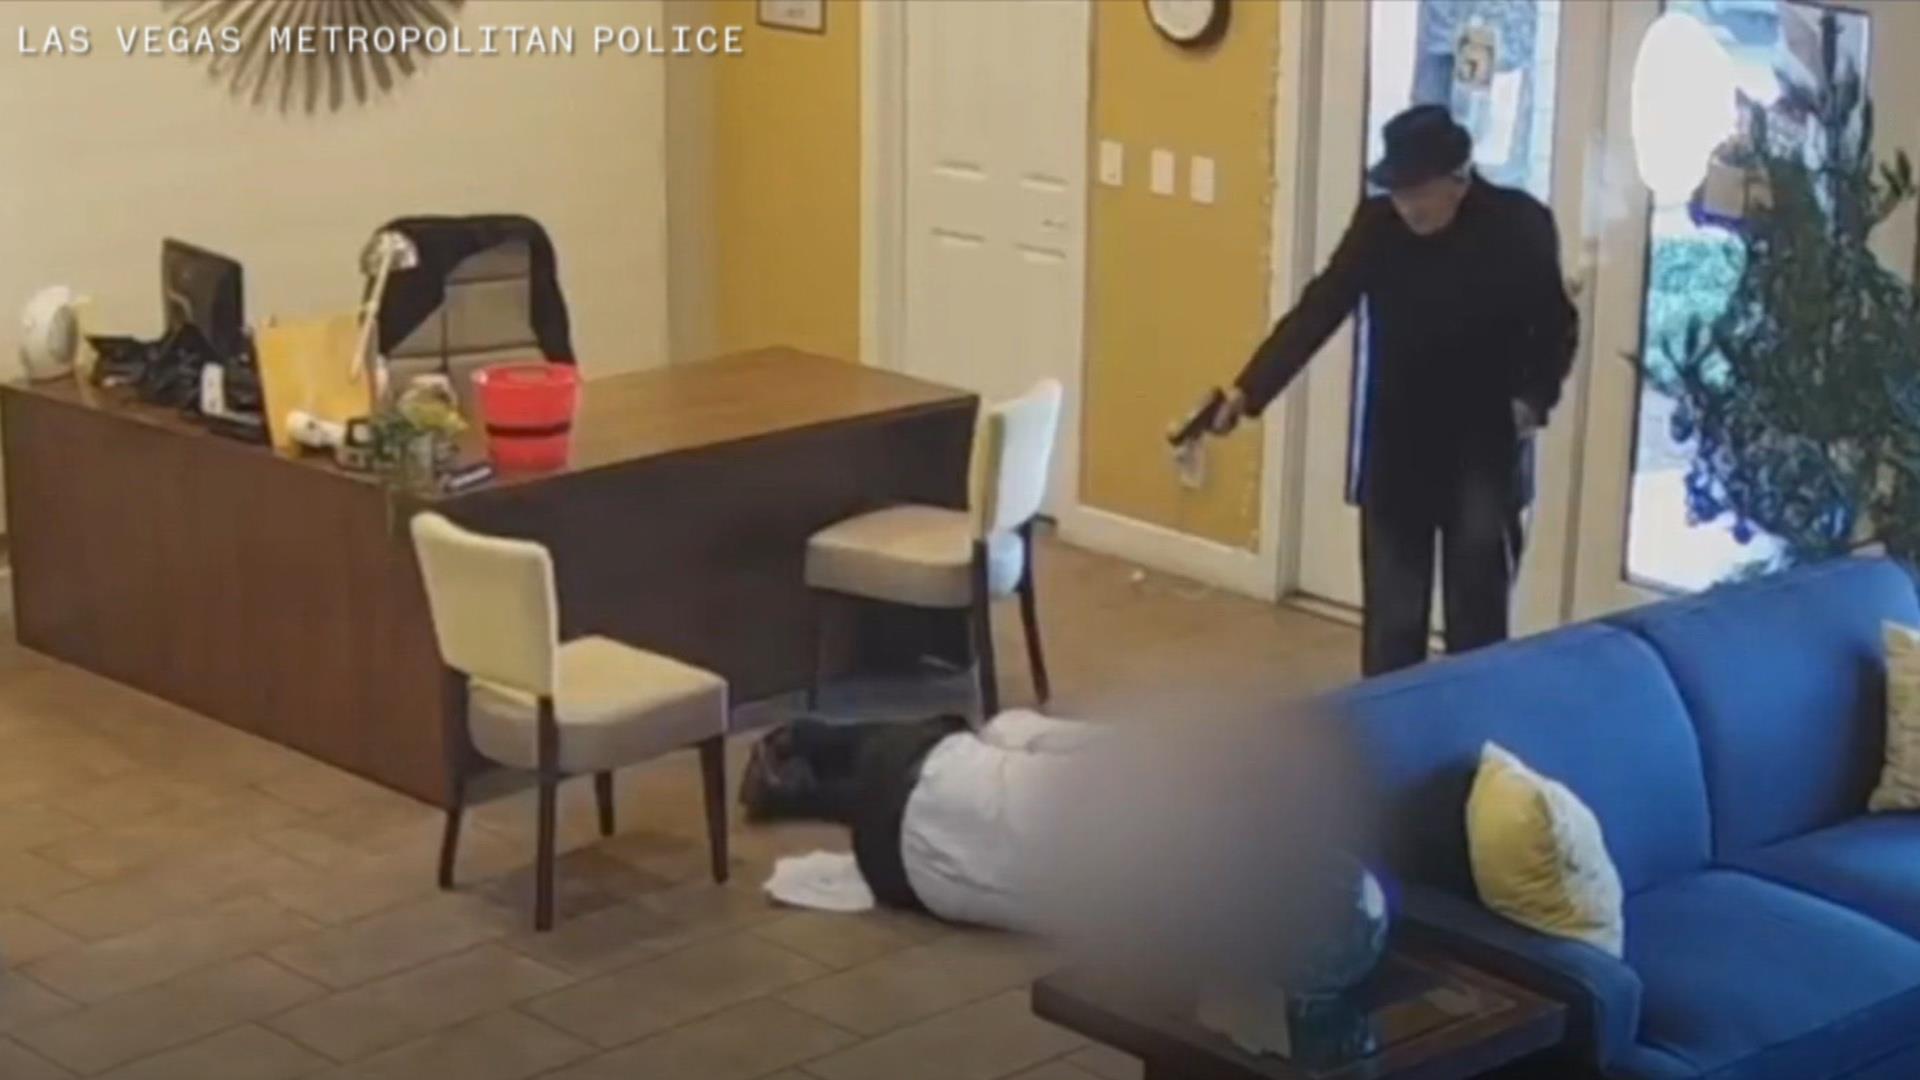 Video shows Las Vegas man, 93, open fire on apartment maintenance worker